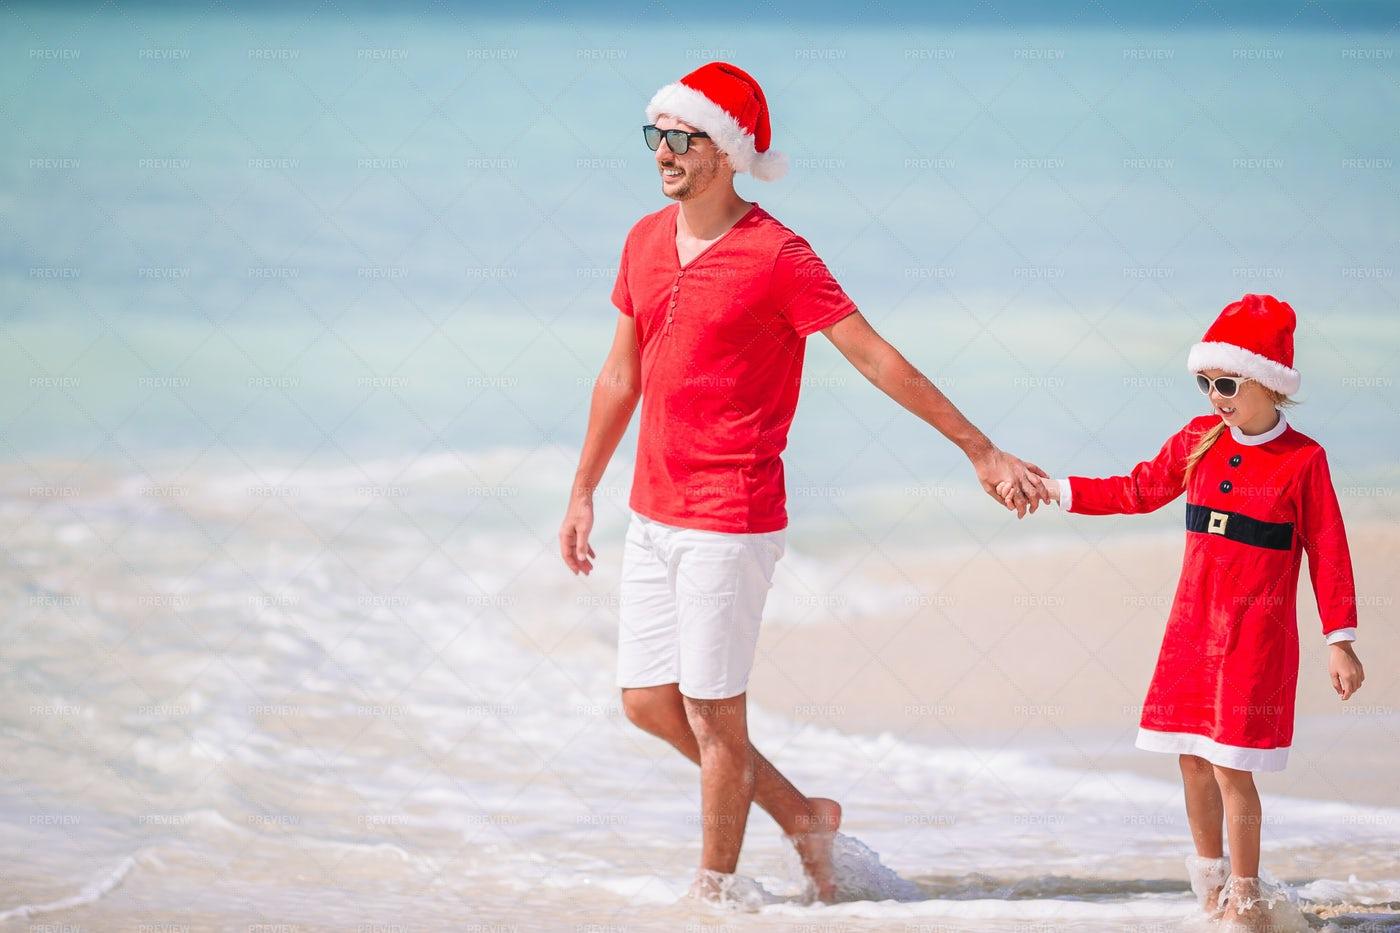 Family Christmas Vacation On Beach: Stock Photos